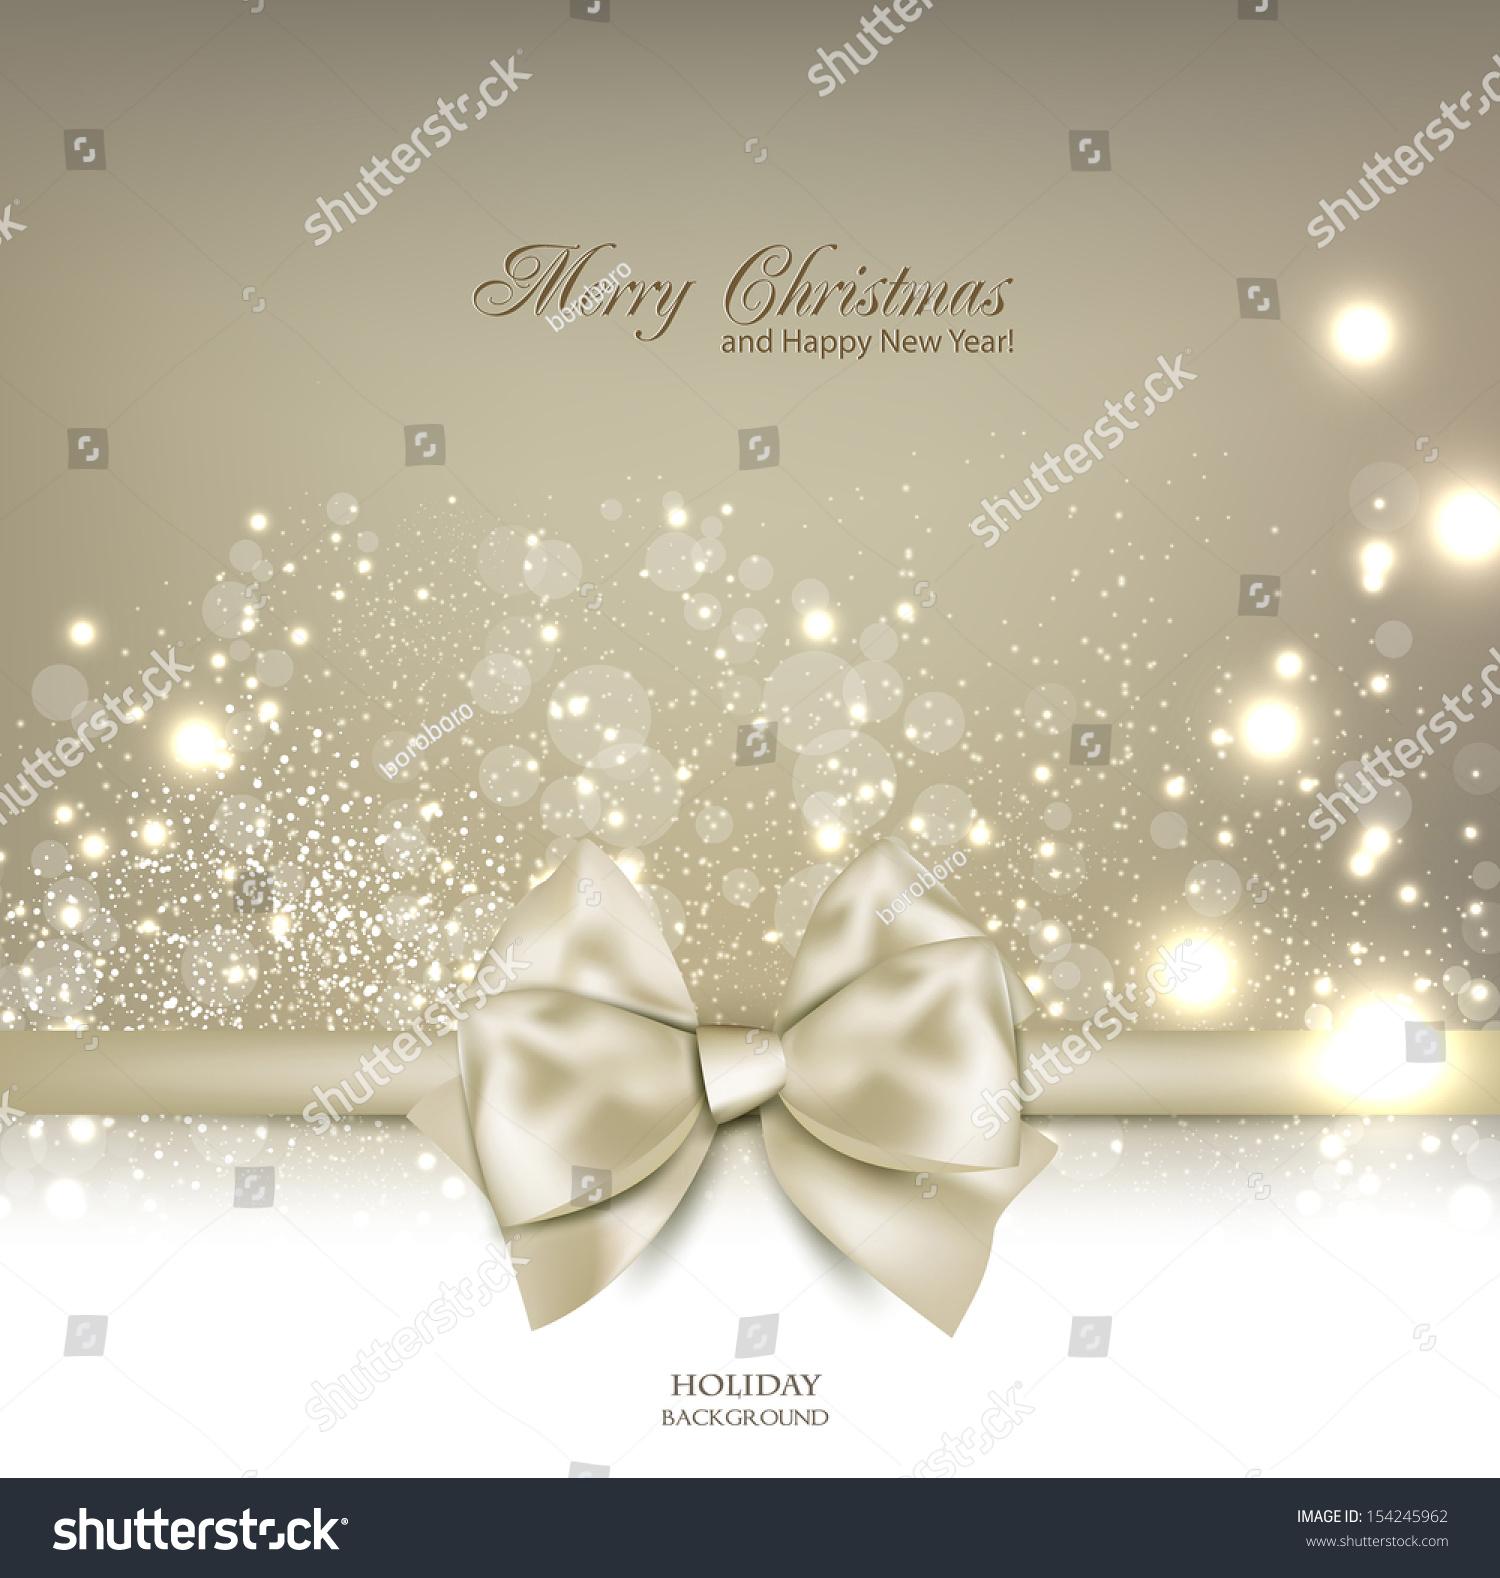 Elegant Christmas Background Images.Elegant Christmas Background Bow Place Text Stock Vector